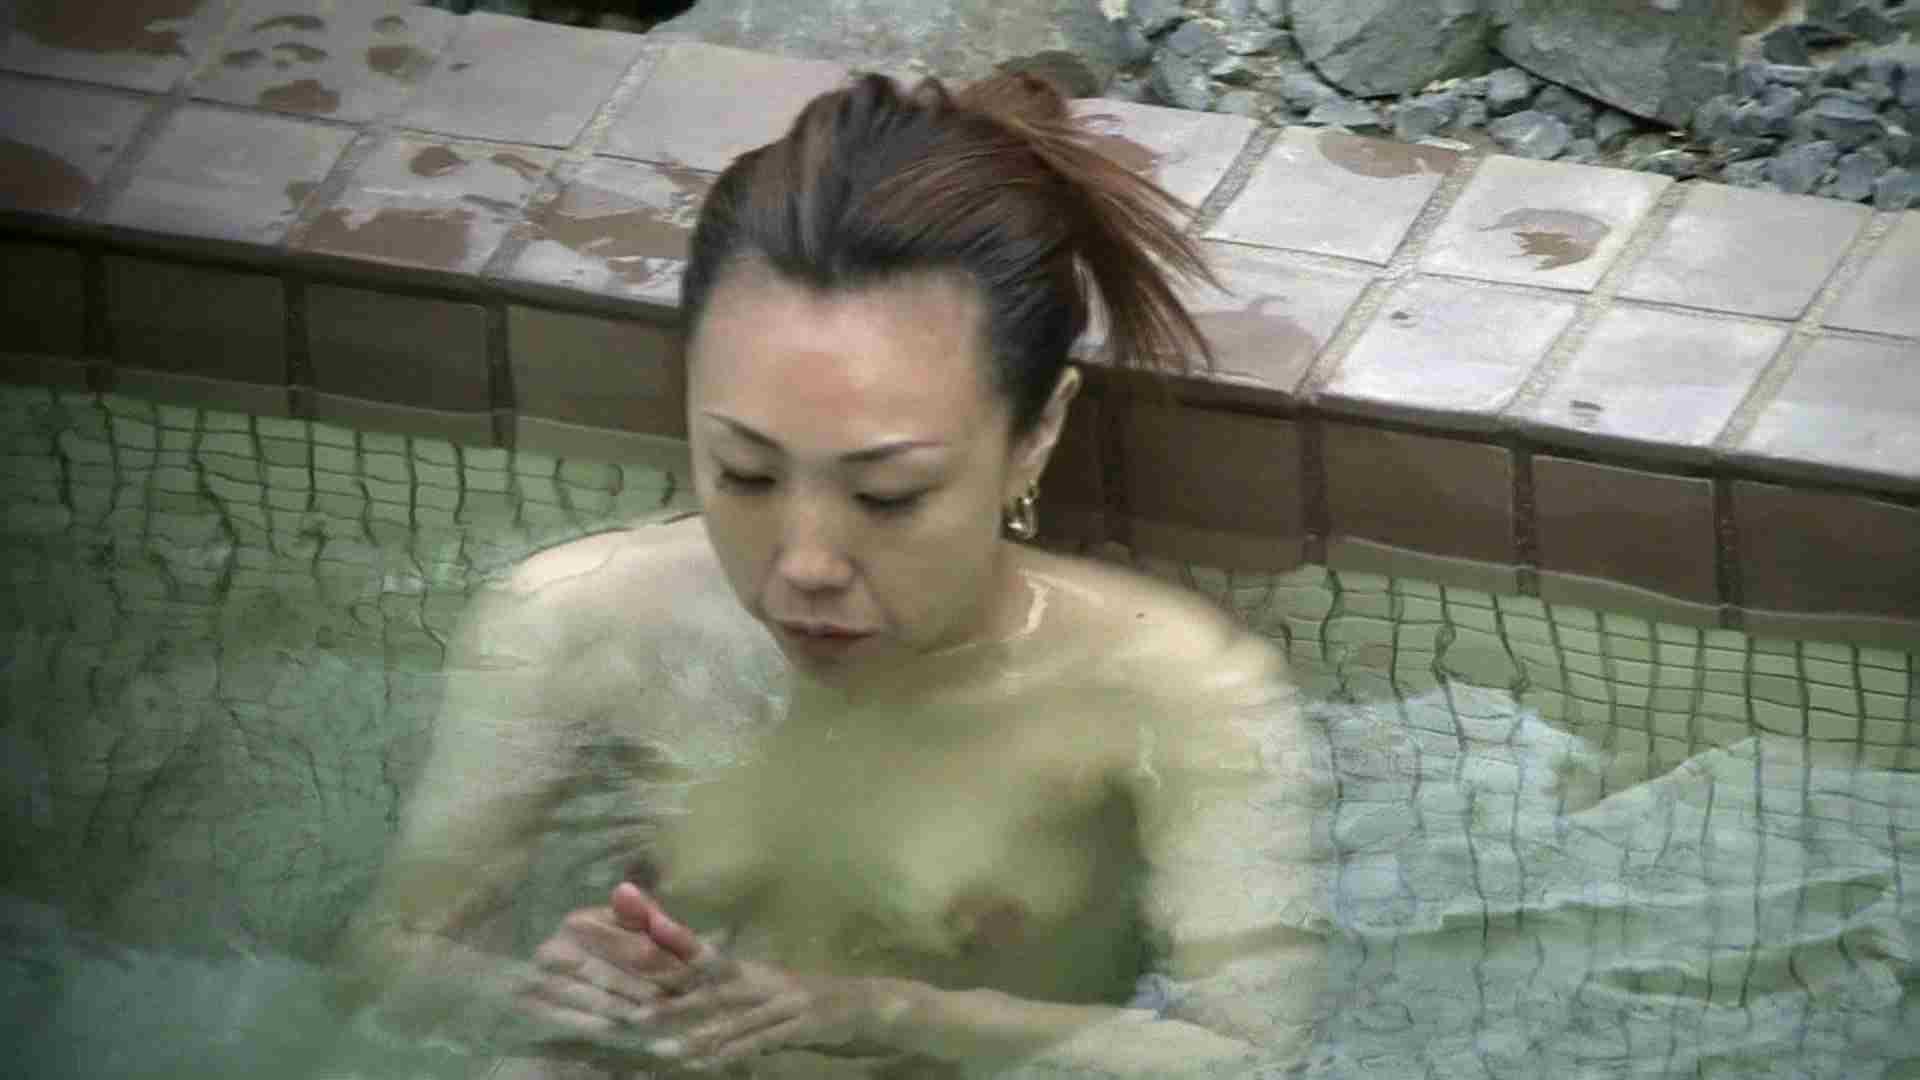 Aquaな露天風呂Vol.654 HなOL | 盗撮  60pic 29